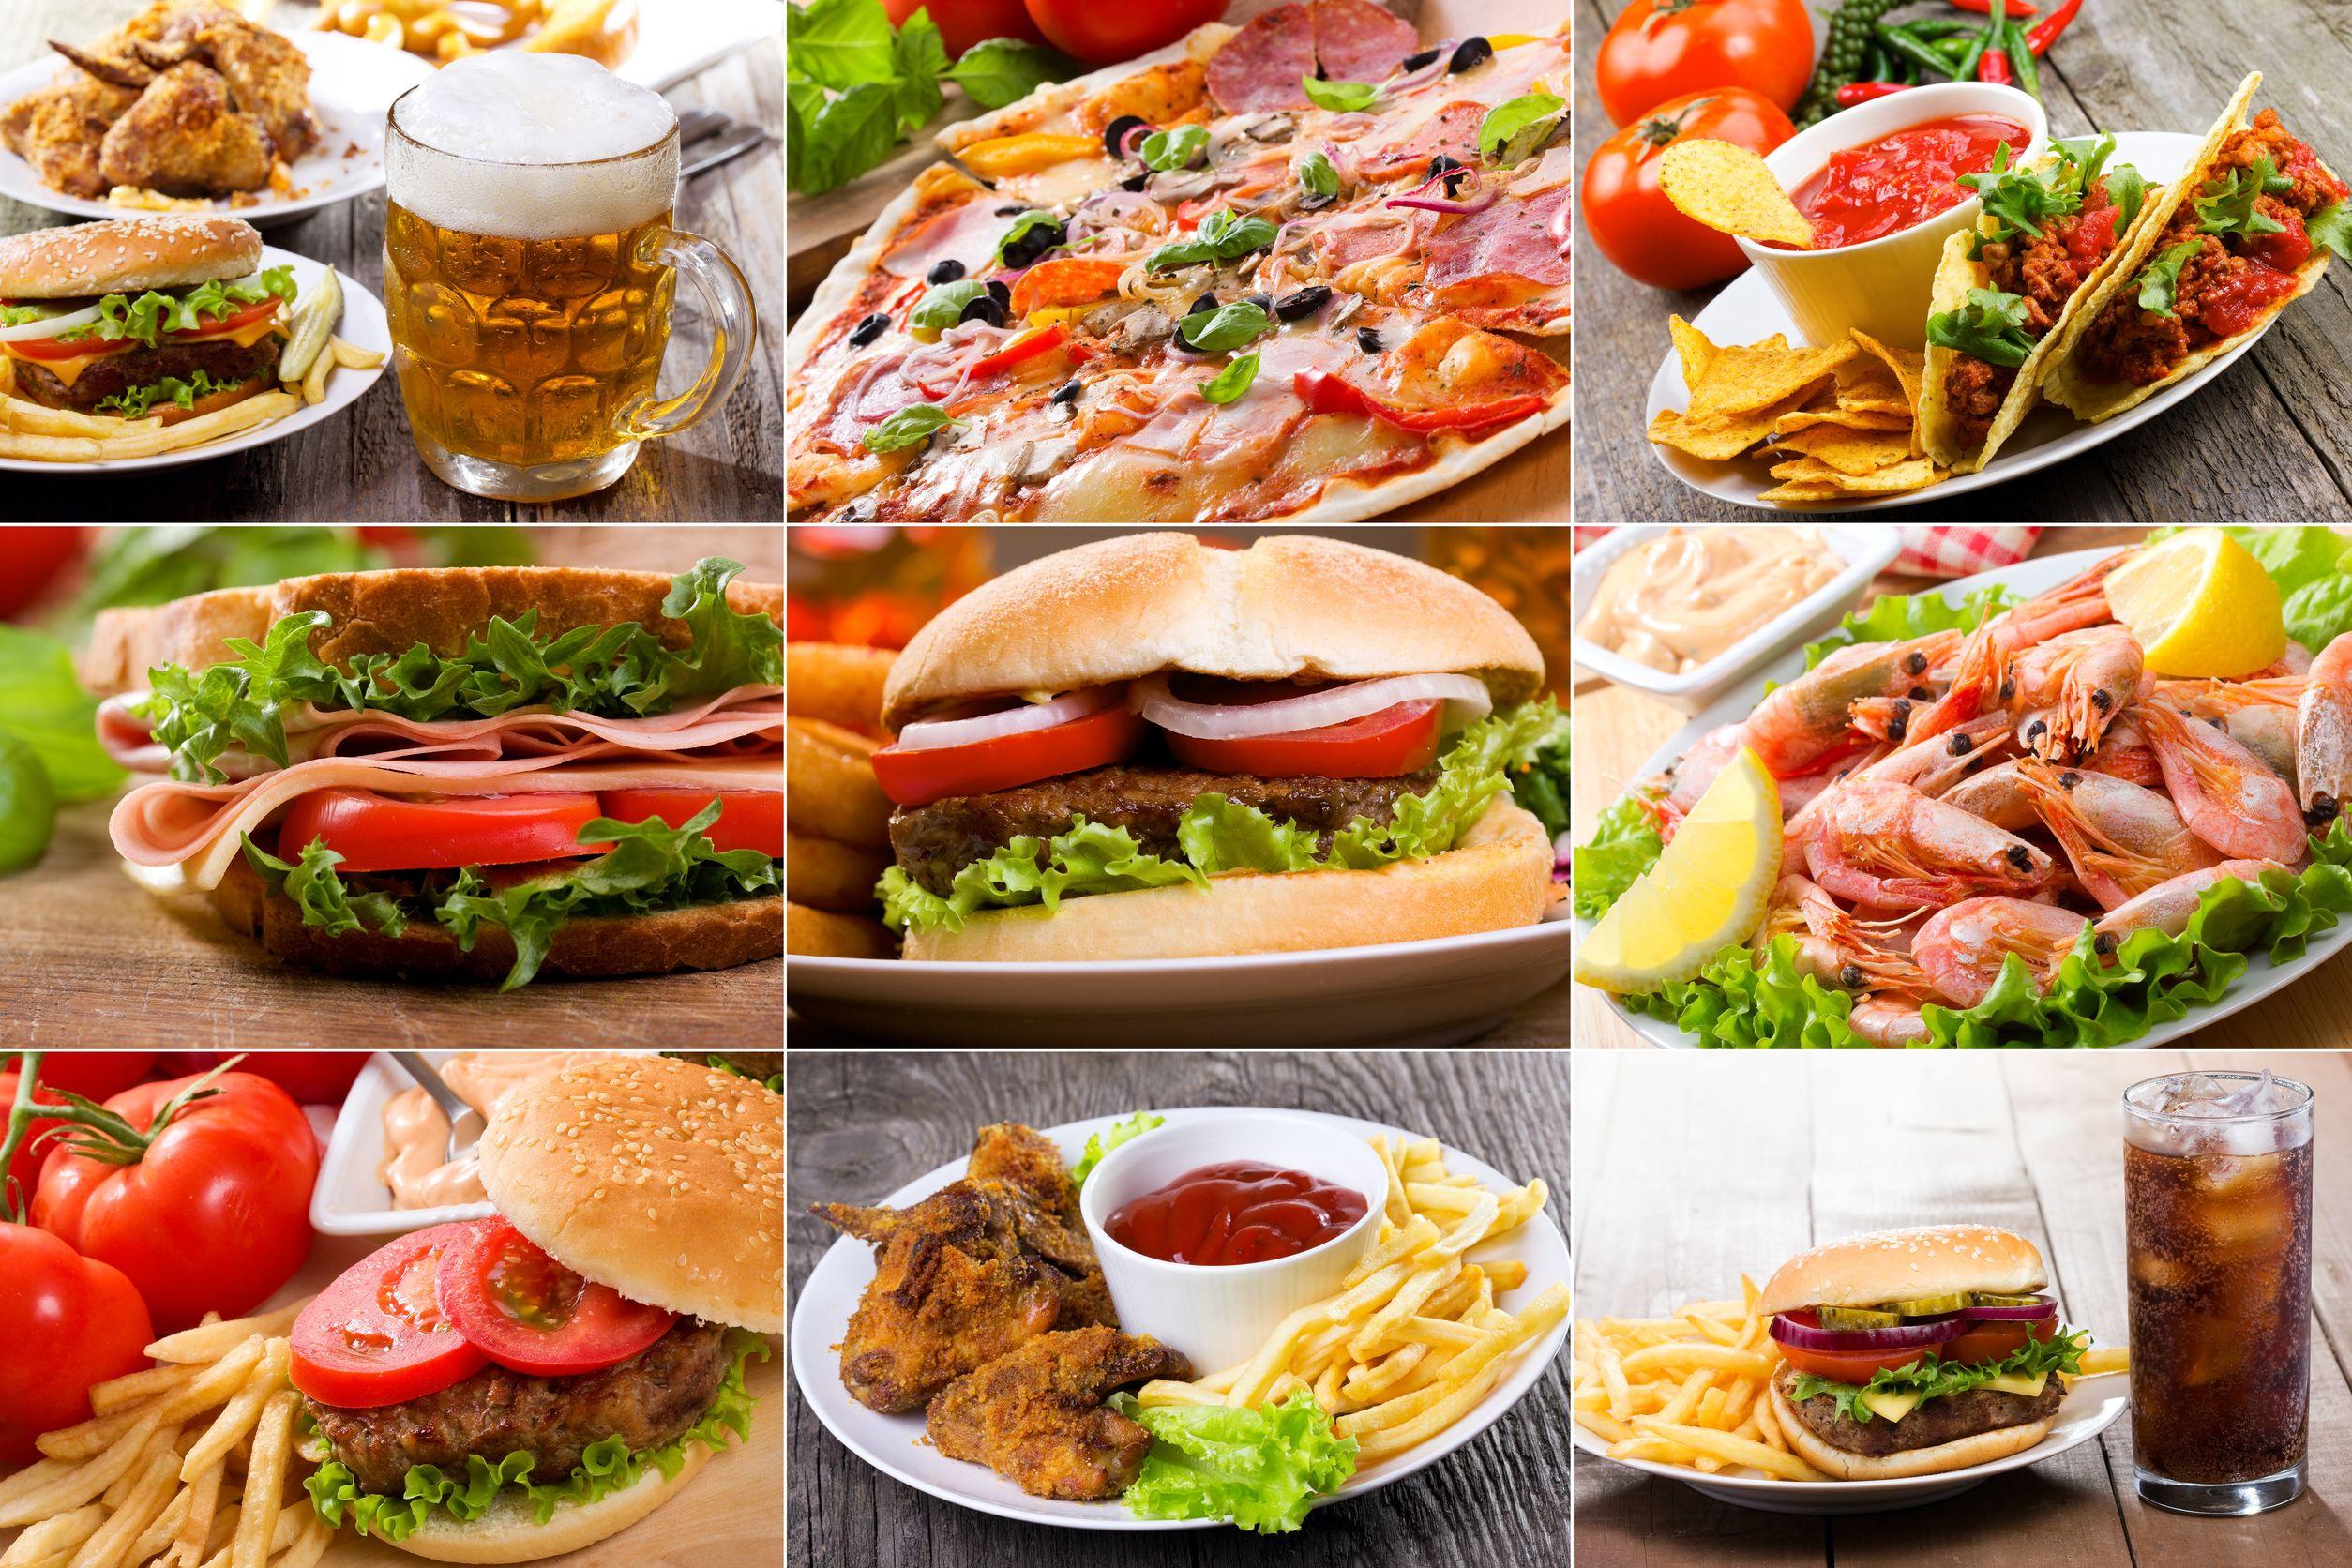 Fast food dan korkmayın